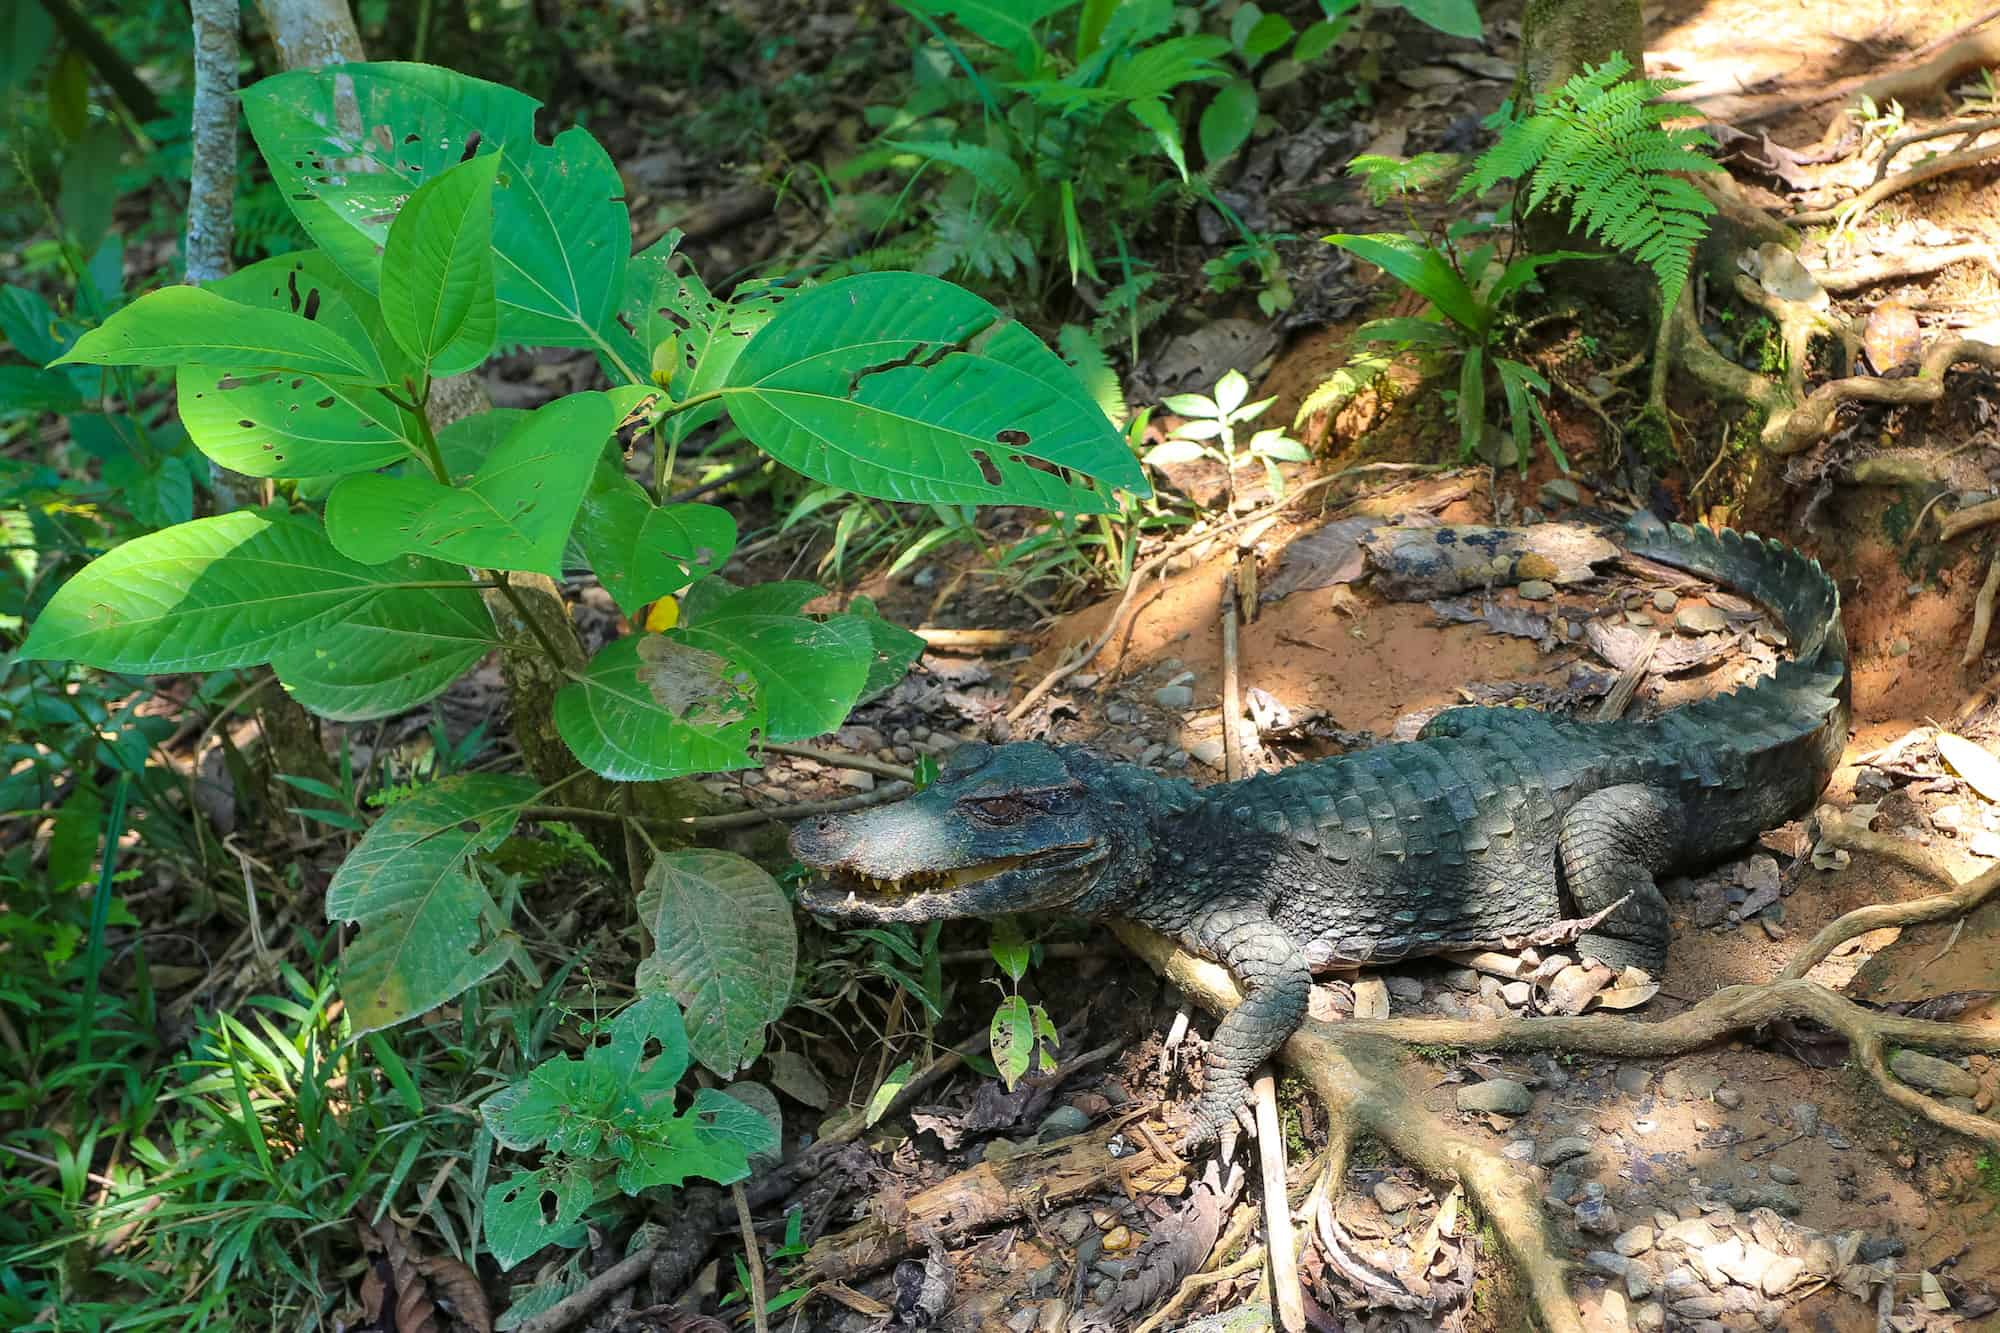 Crocodile - Coca Ecuador - Yasuni National Park